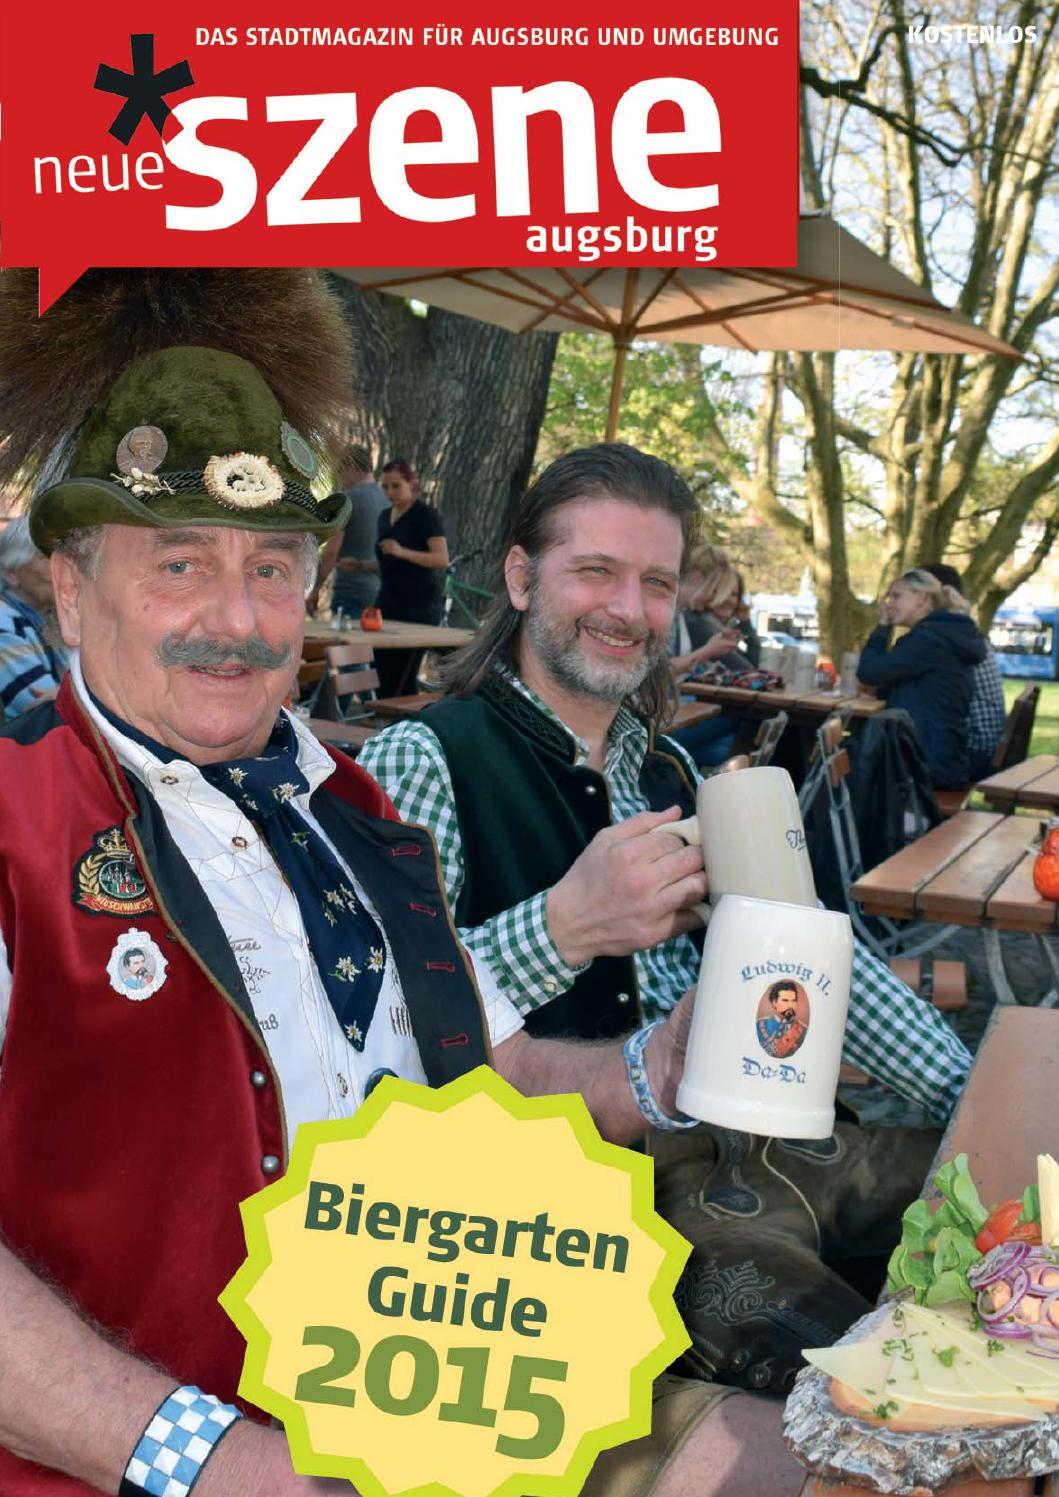 Biergarten Guide Augsburg 2015 By Neue Szene Augsburg Issuu